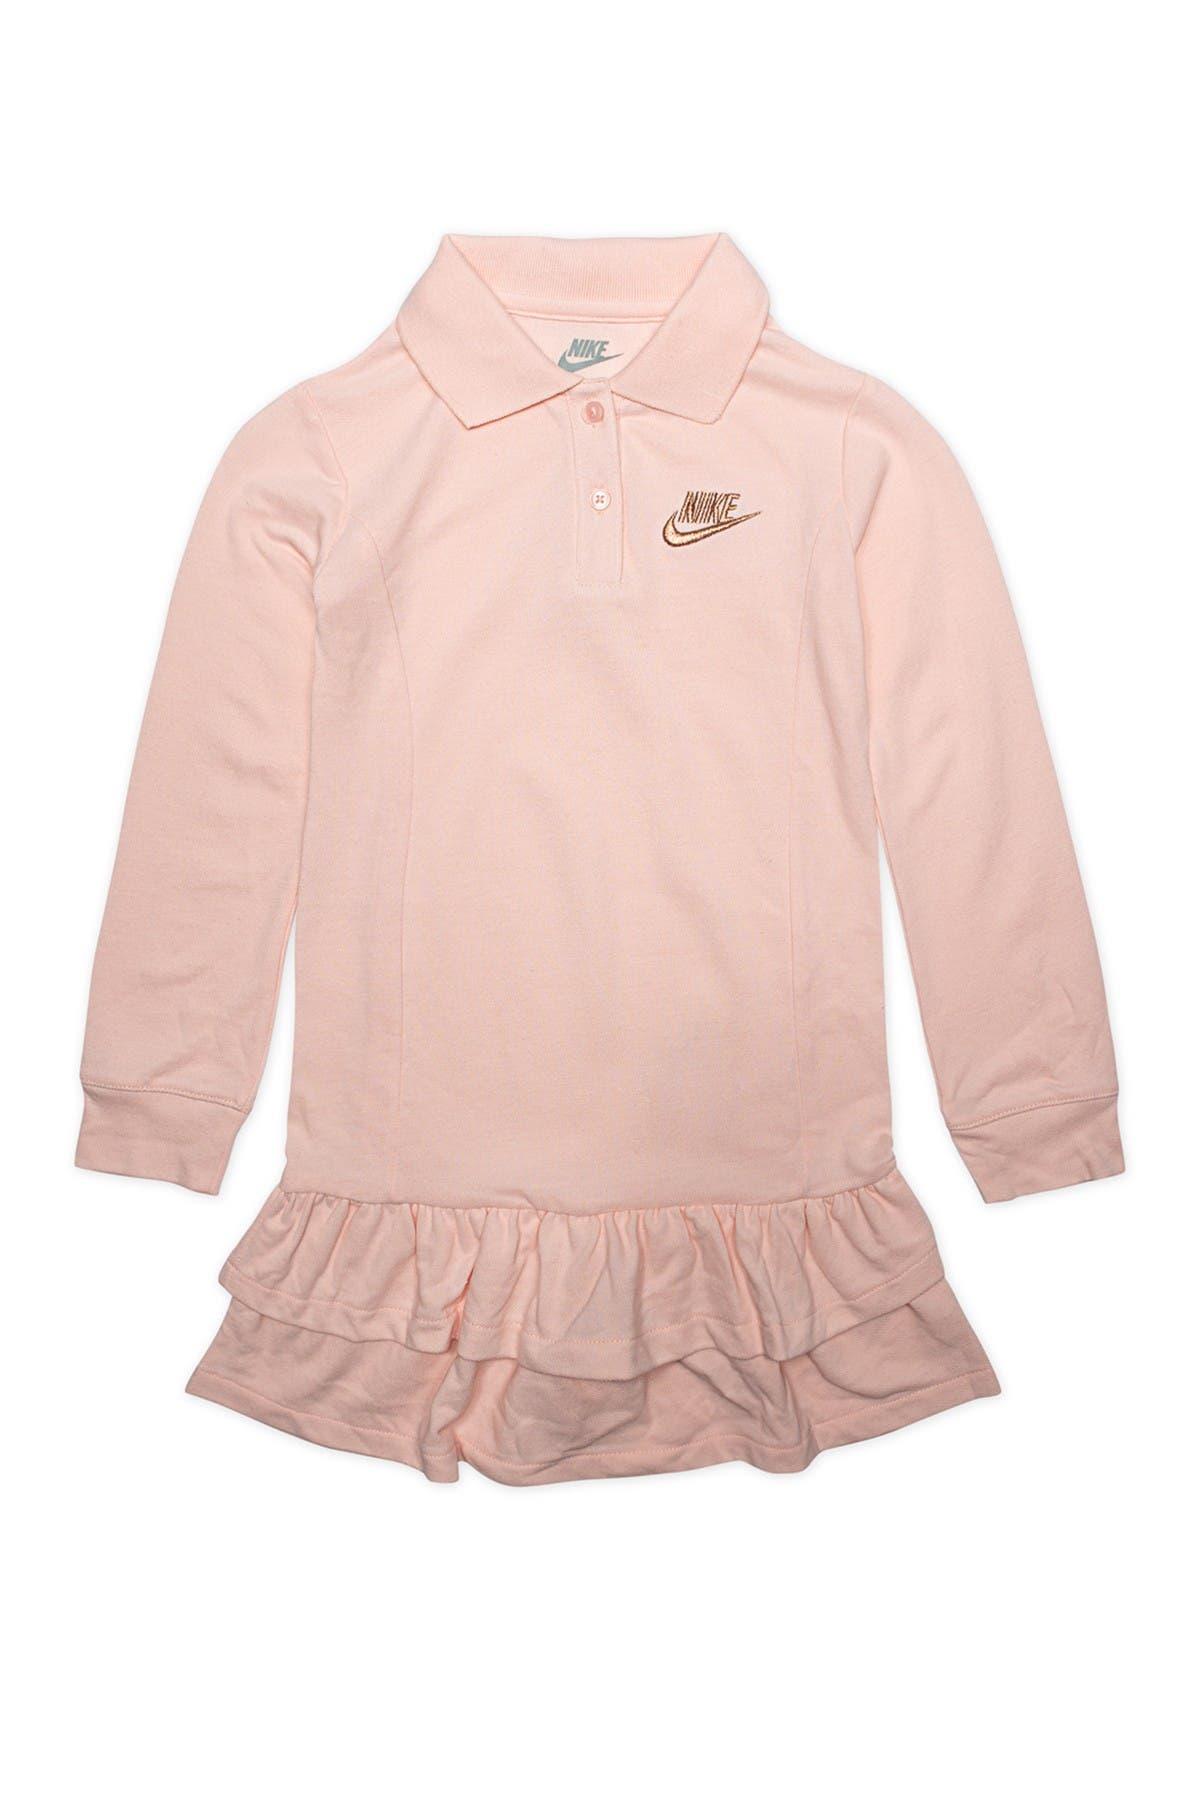 Image of Nike Long Sleeve Polo Dress